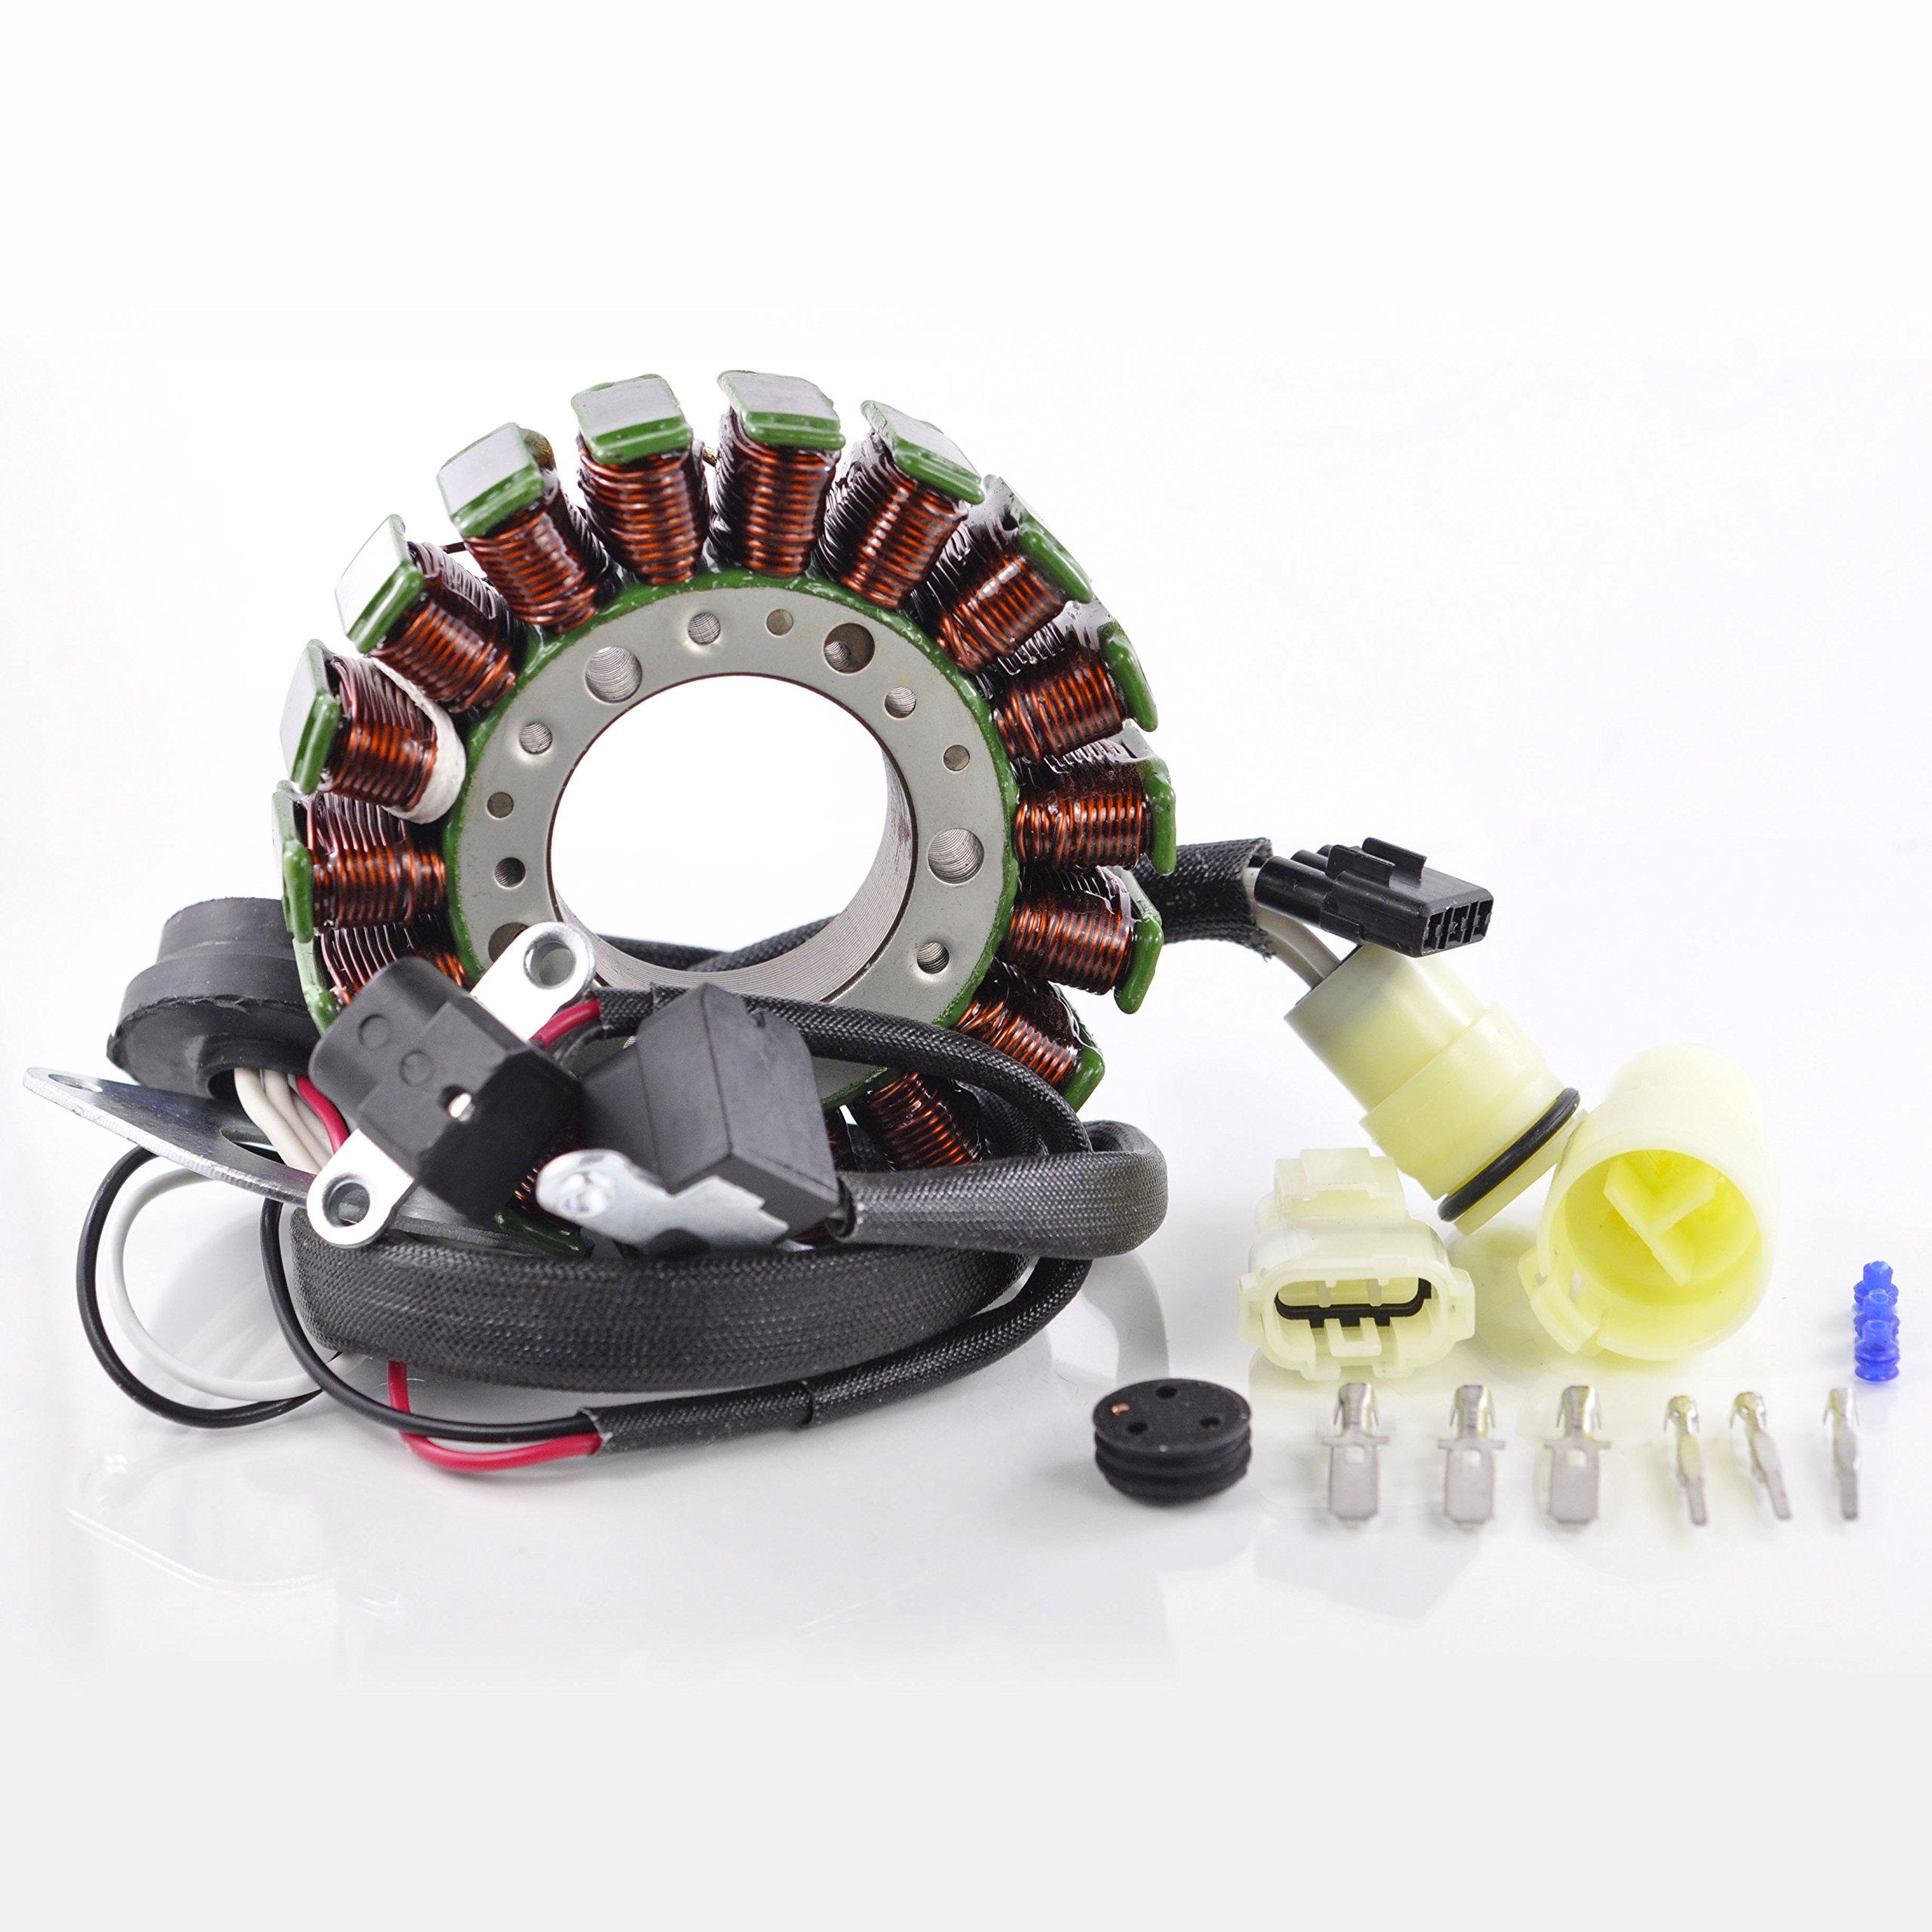 Generator Stator For Yamaha Waverunner FX Cruiser VX Deluxe Sport 1000 1100 AR SR SX 230 GP 1300 R 212 SS X 232 Limited 2002-2015 OEM Repl.# 60E-81410-00-00 60E-81410-01-00 6D3-81410-00-00 by RMSTATOR